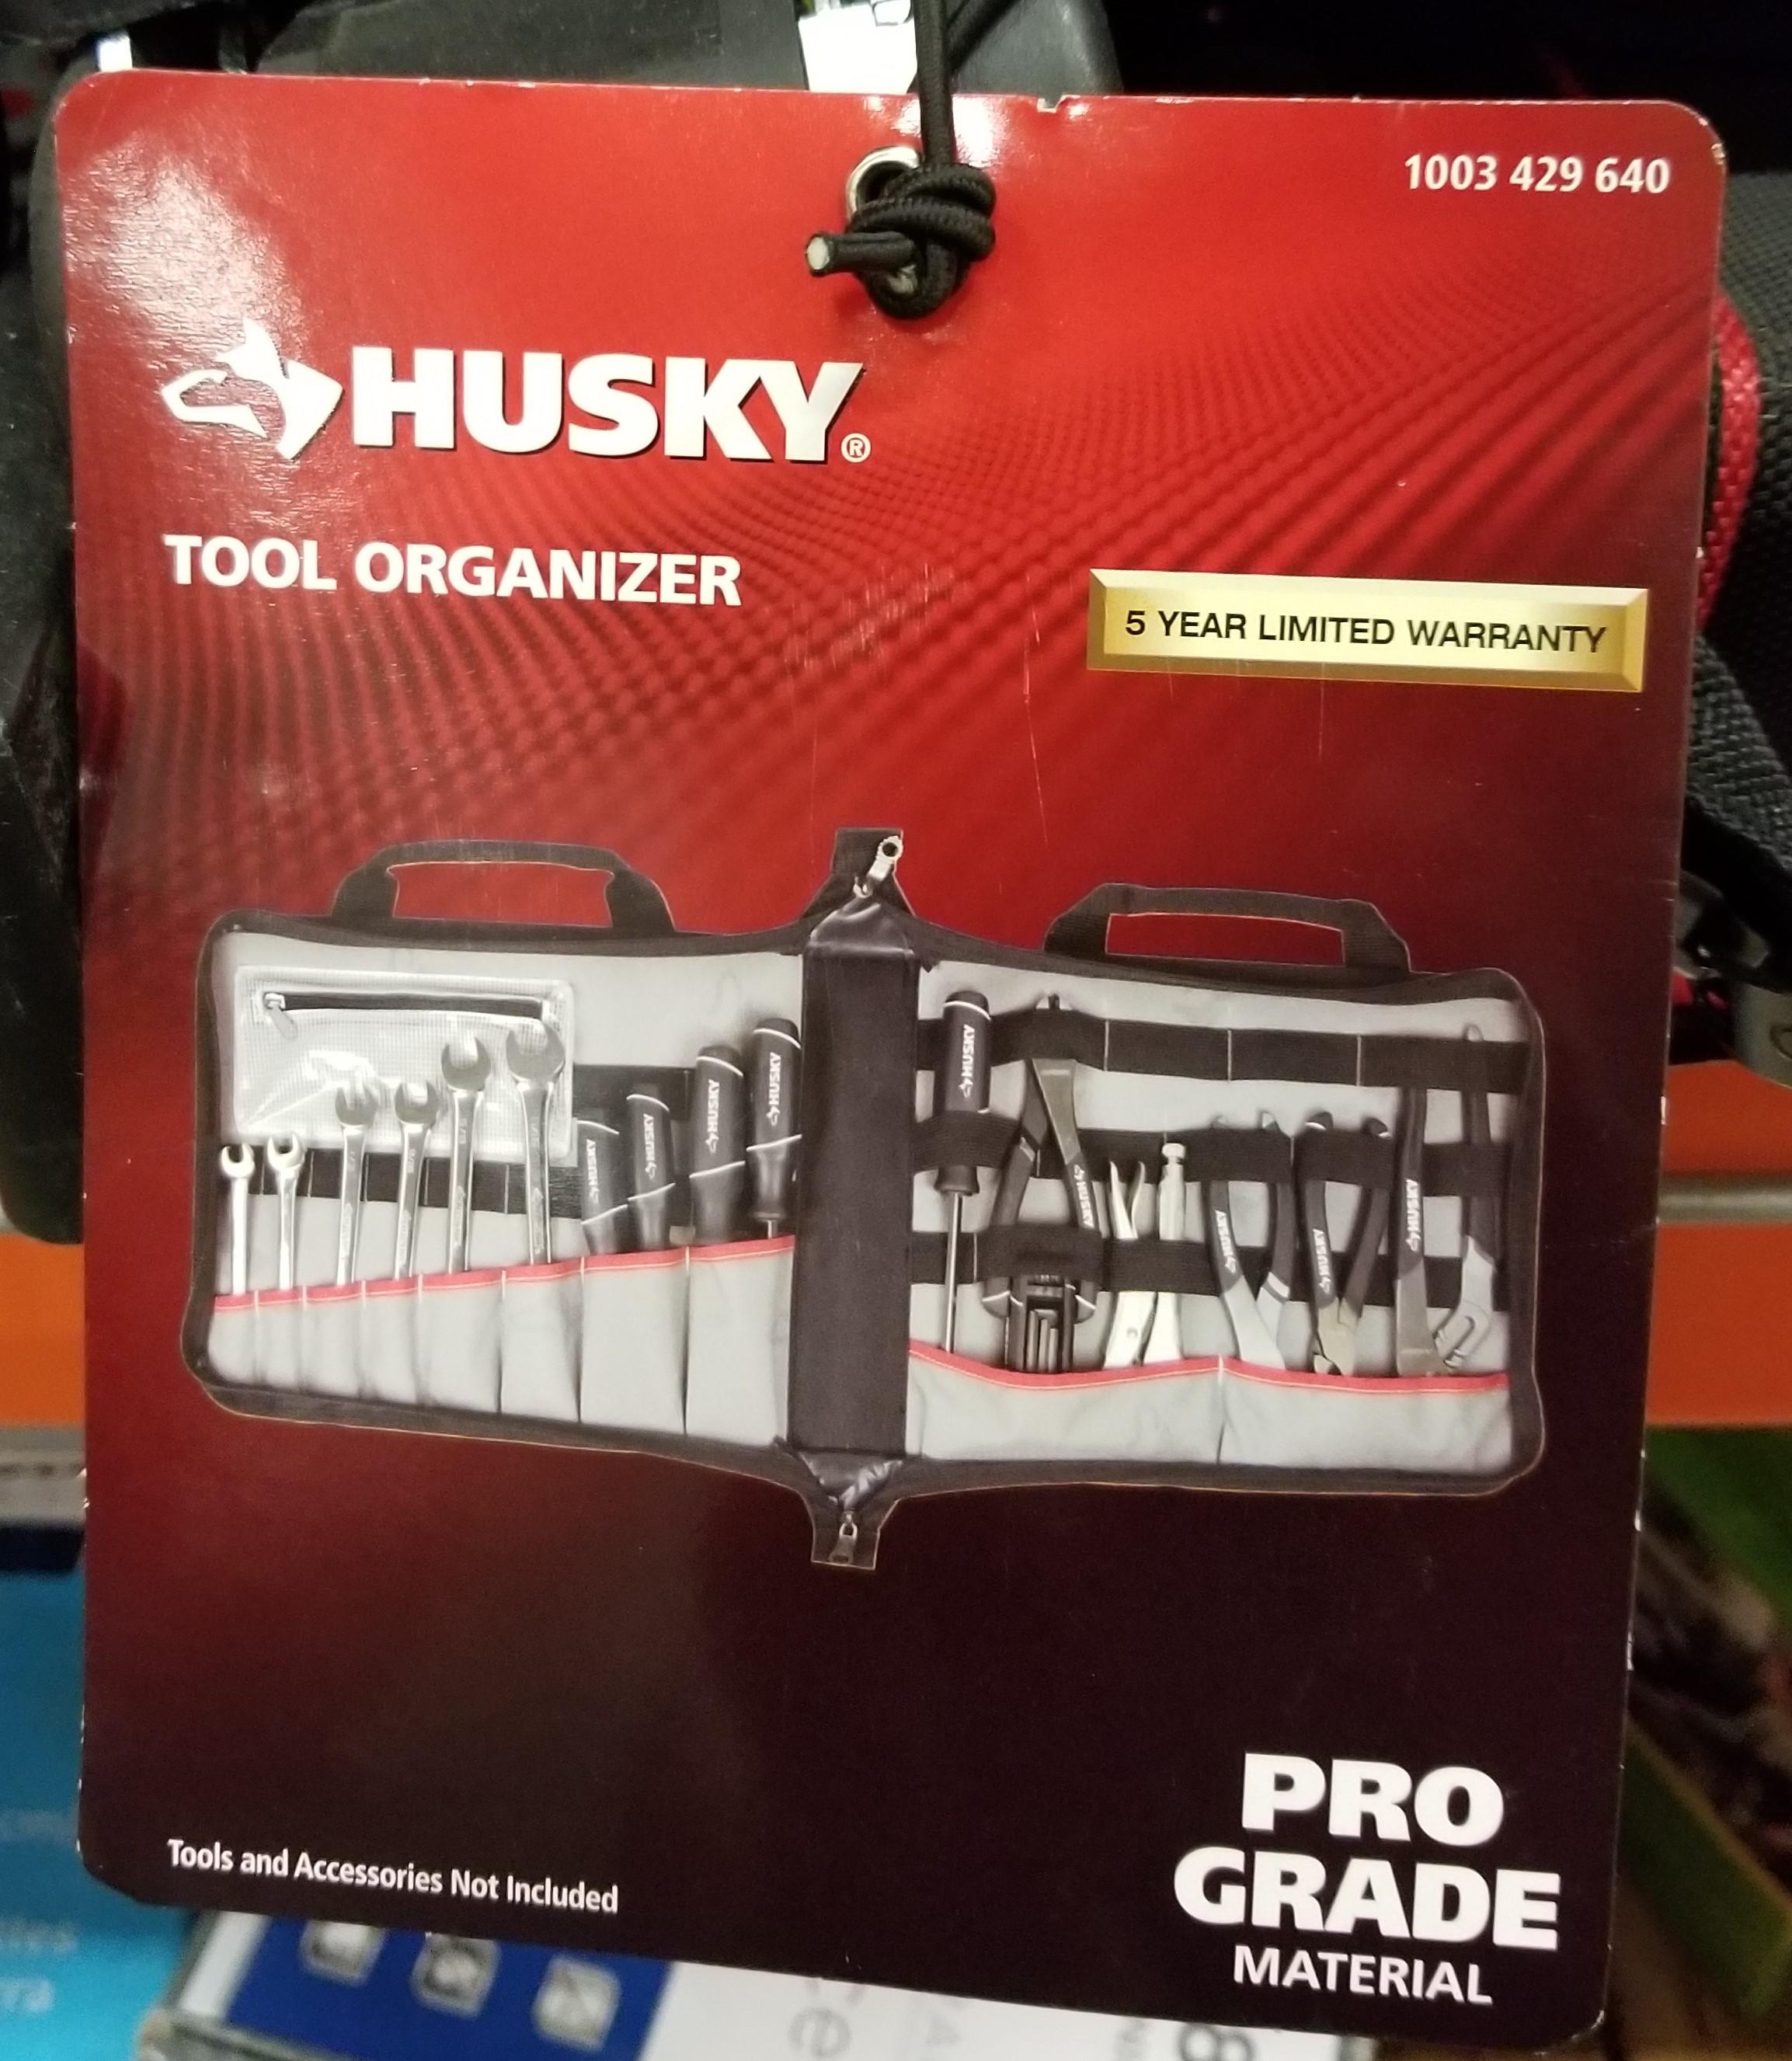 Home Depot Husky 15 in. Pro Tool Organizer $5.03 (YMMV)